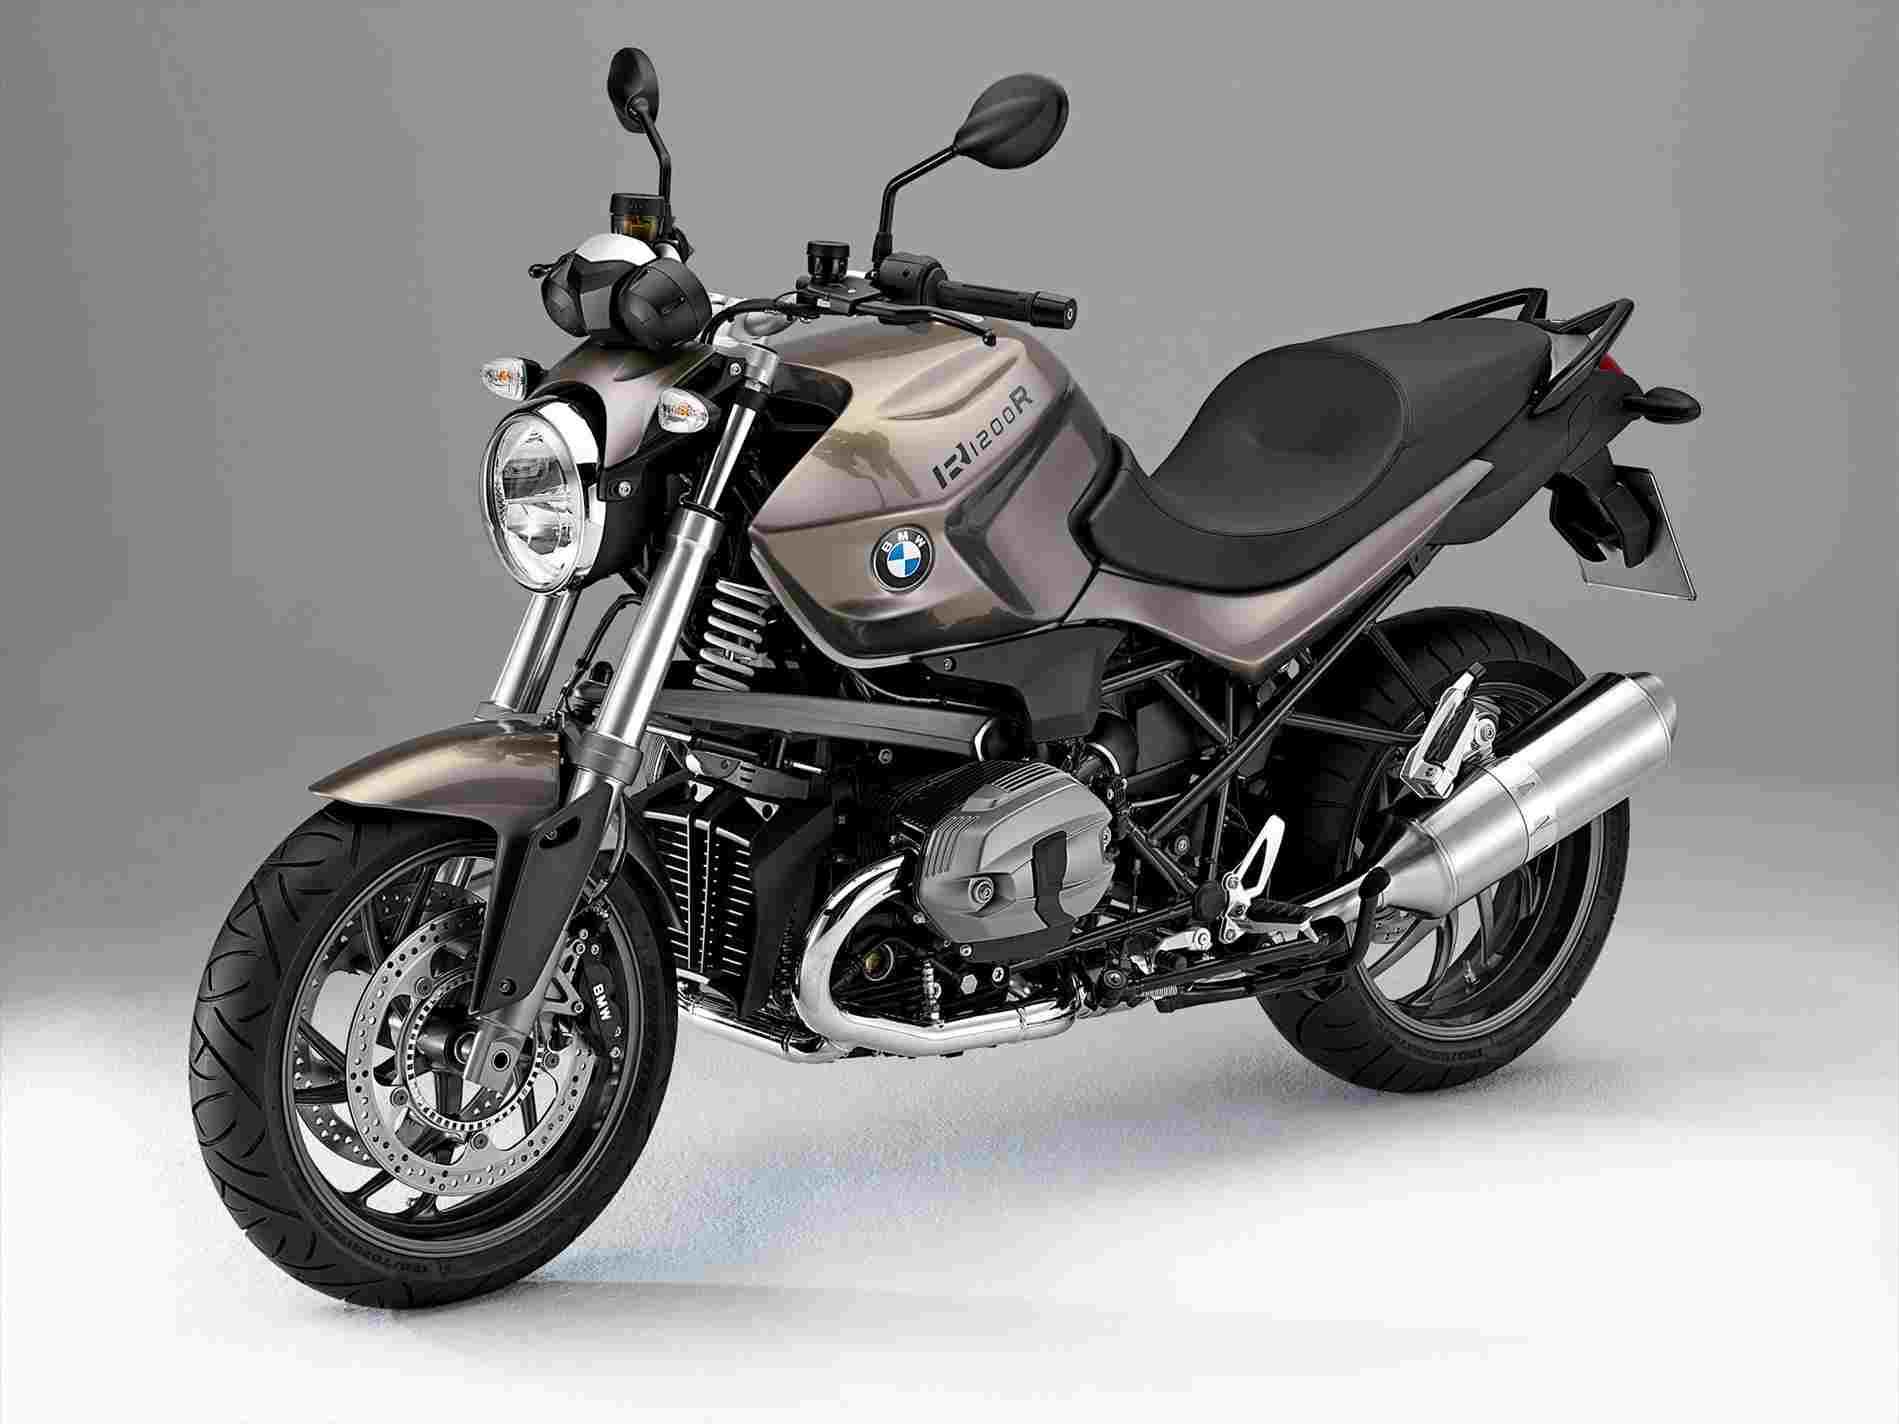 Dhoom 3 Bmw Bike Photos Engine88 Info Engine88 Info Bmw R1200r 2018 1613790 Hd Wallpaper Backgrounds Download